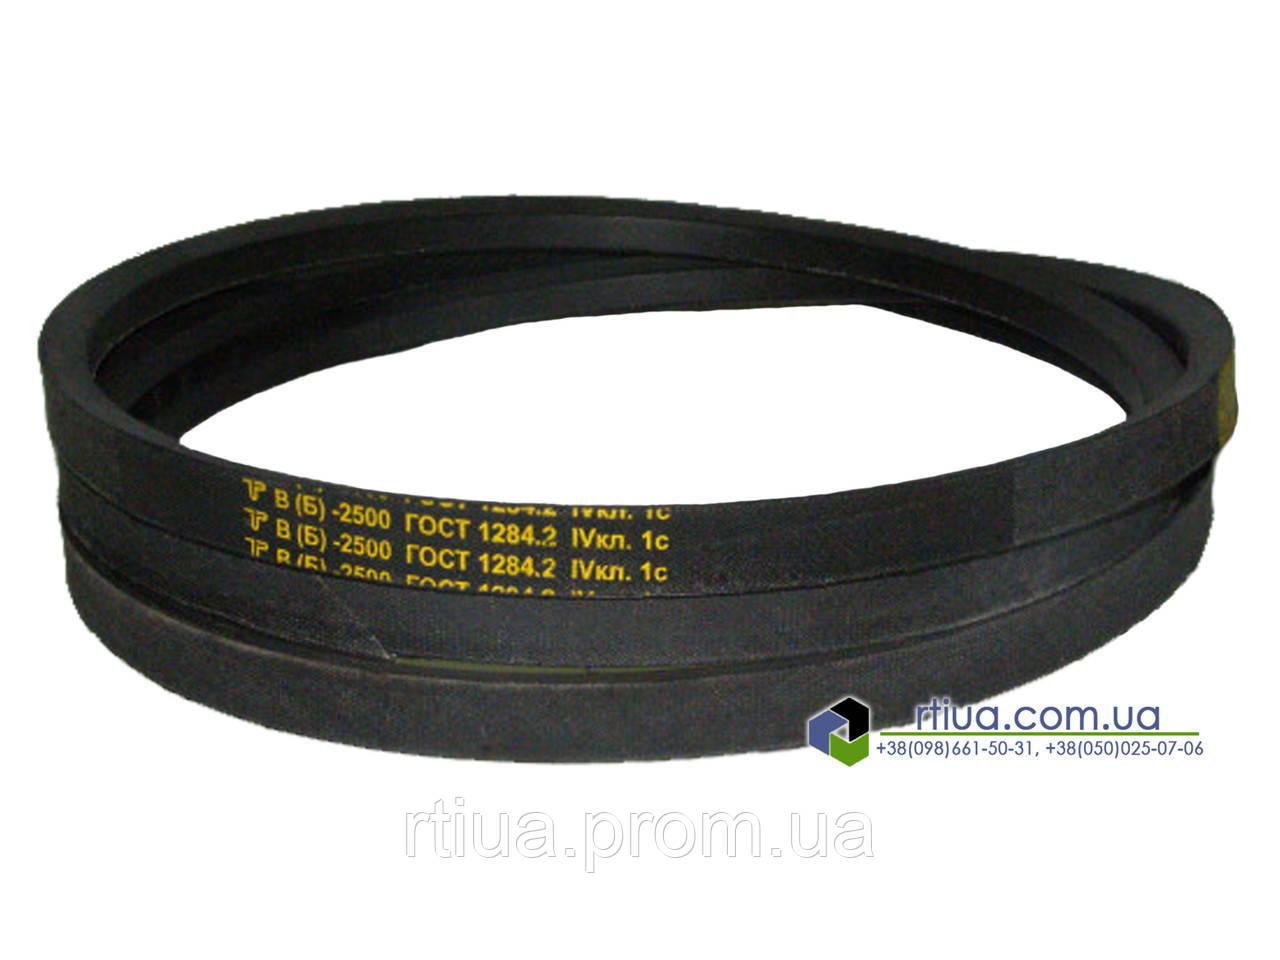 Ремень узкоклиновой УВ-6700 БЦ